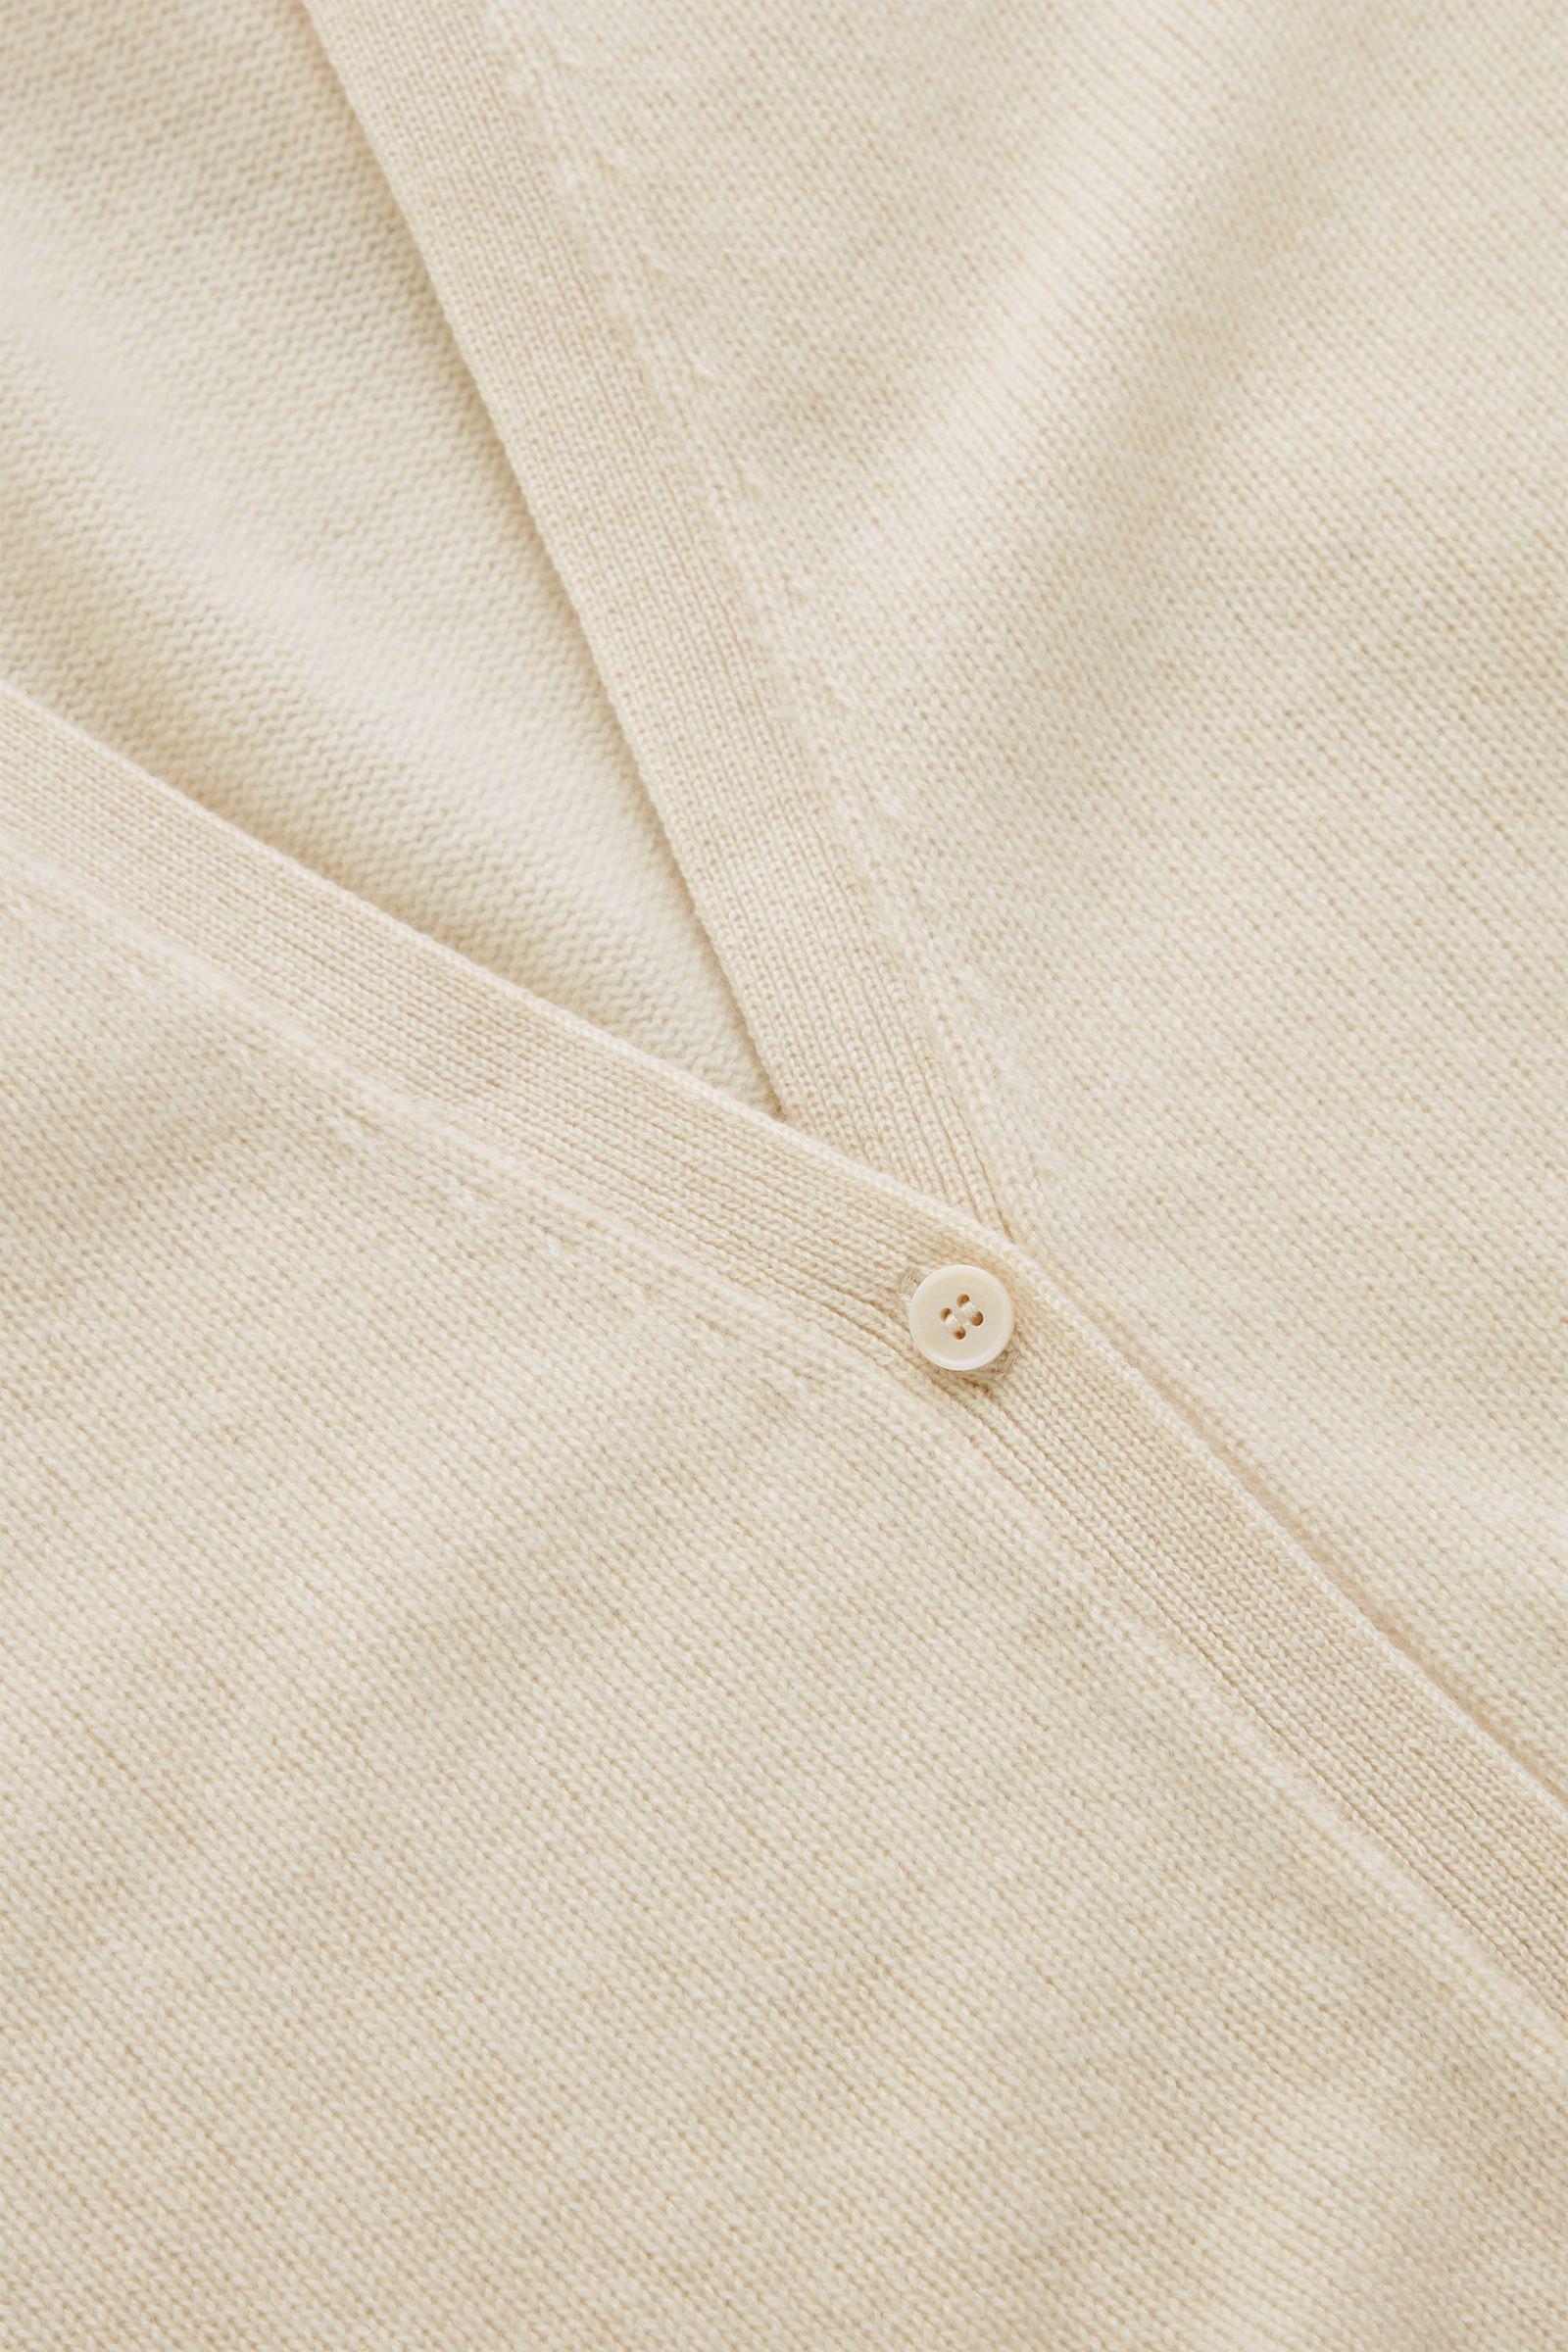 COS 니티드 캐시미어 가디건의 화이트컬러 Detail입니다.